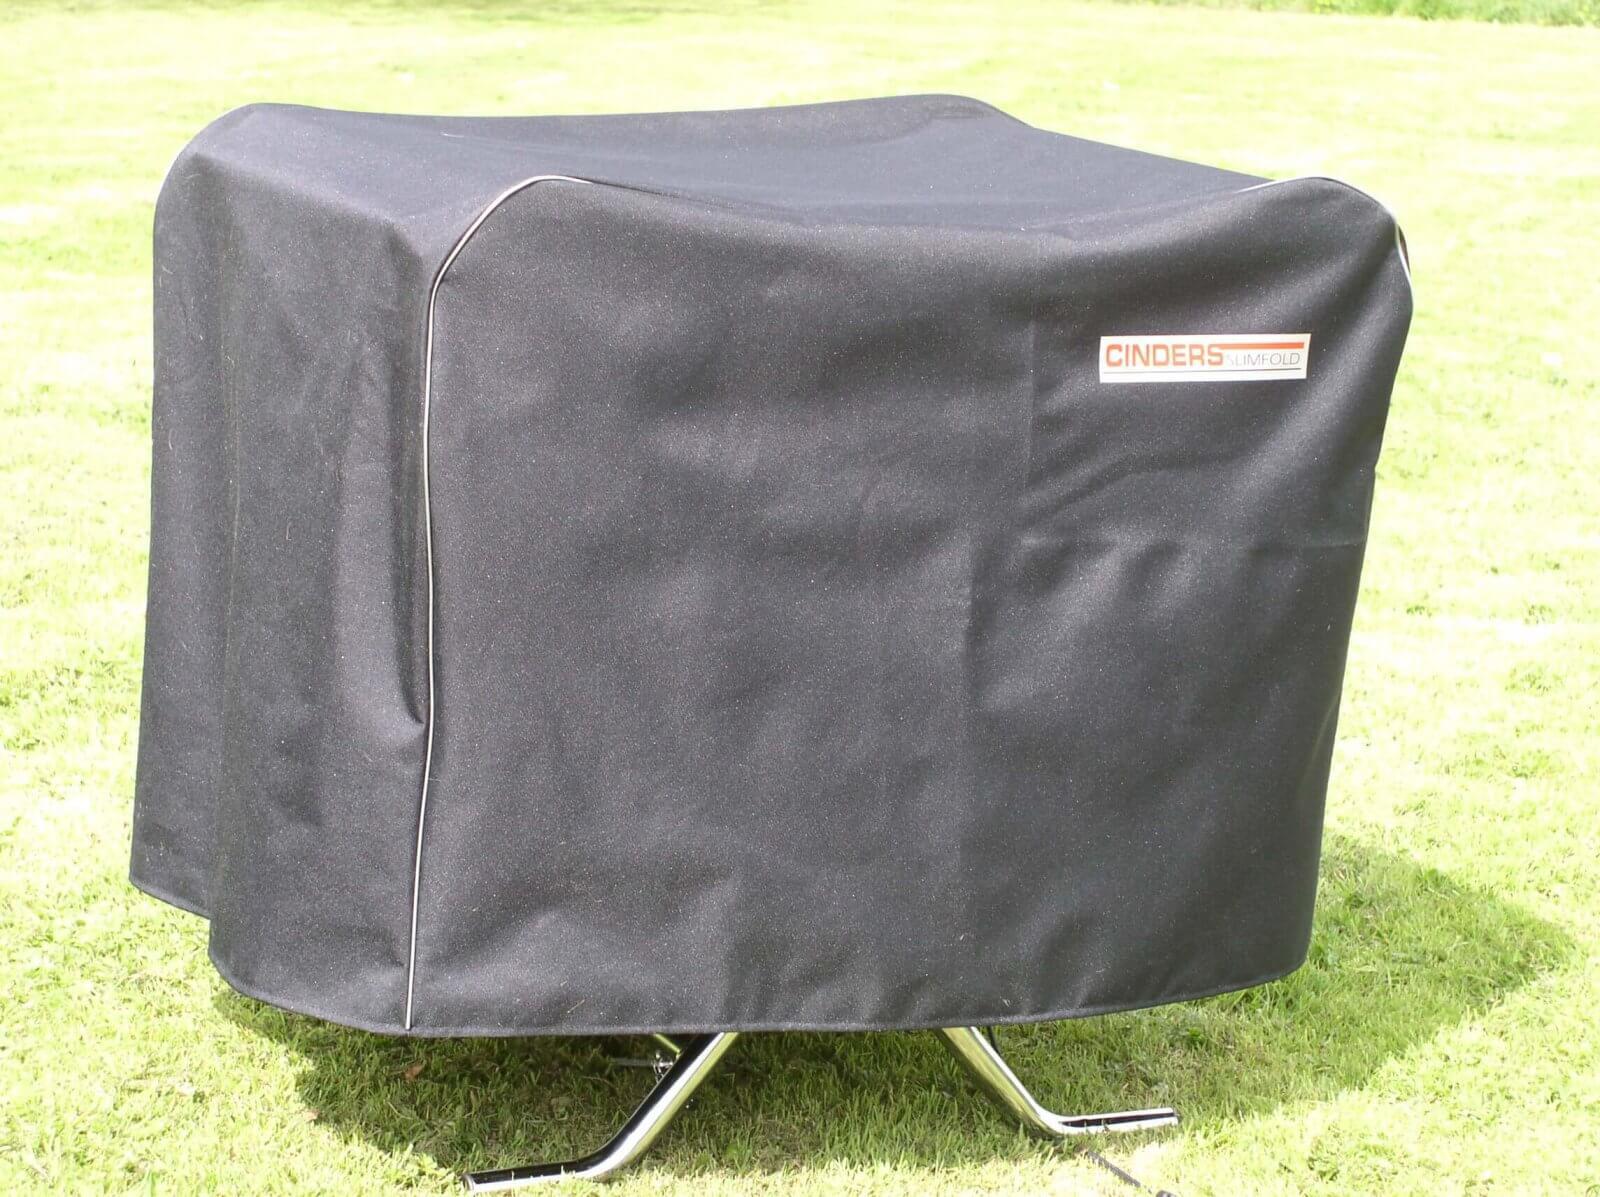 SG80 Barbecue Cover